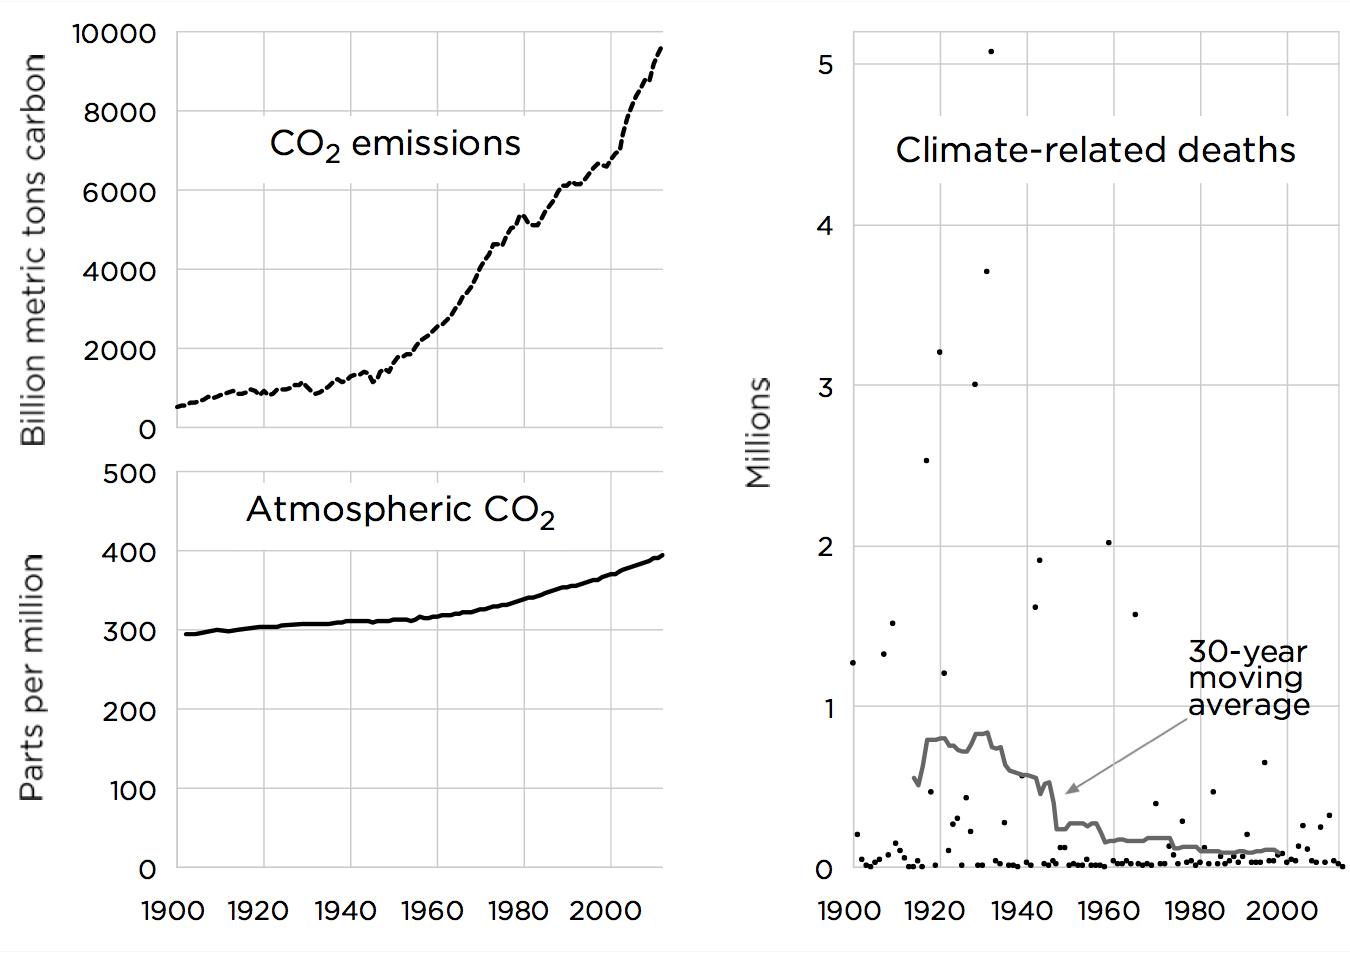 Sources: Boden, Marland, Andres (2013); Etheridge et al. (1998); Keeling et al. (2001); MacFarling Meure et al. (2006); Merged IceCore Record Data, Scripps Institution of Oceanography; EM-DAT International Disaster Database